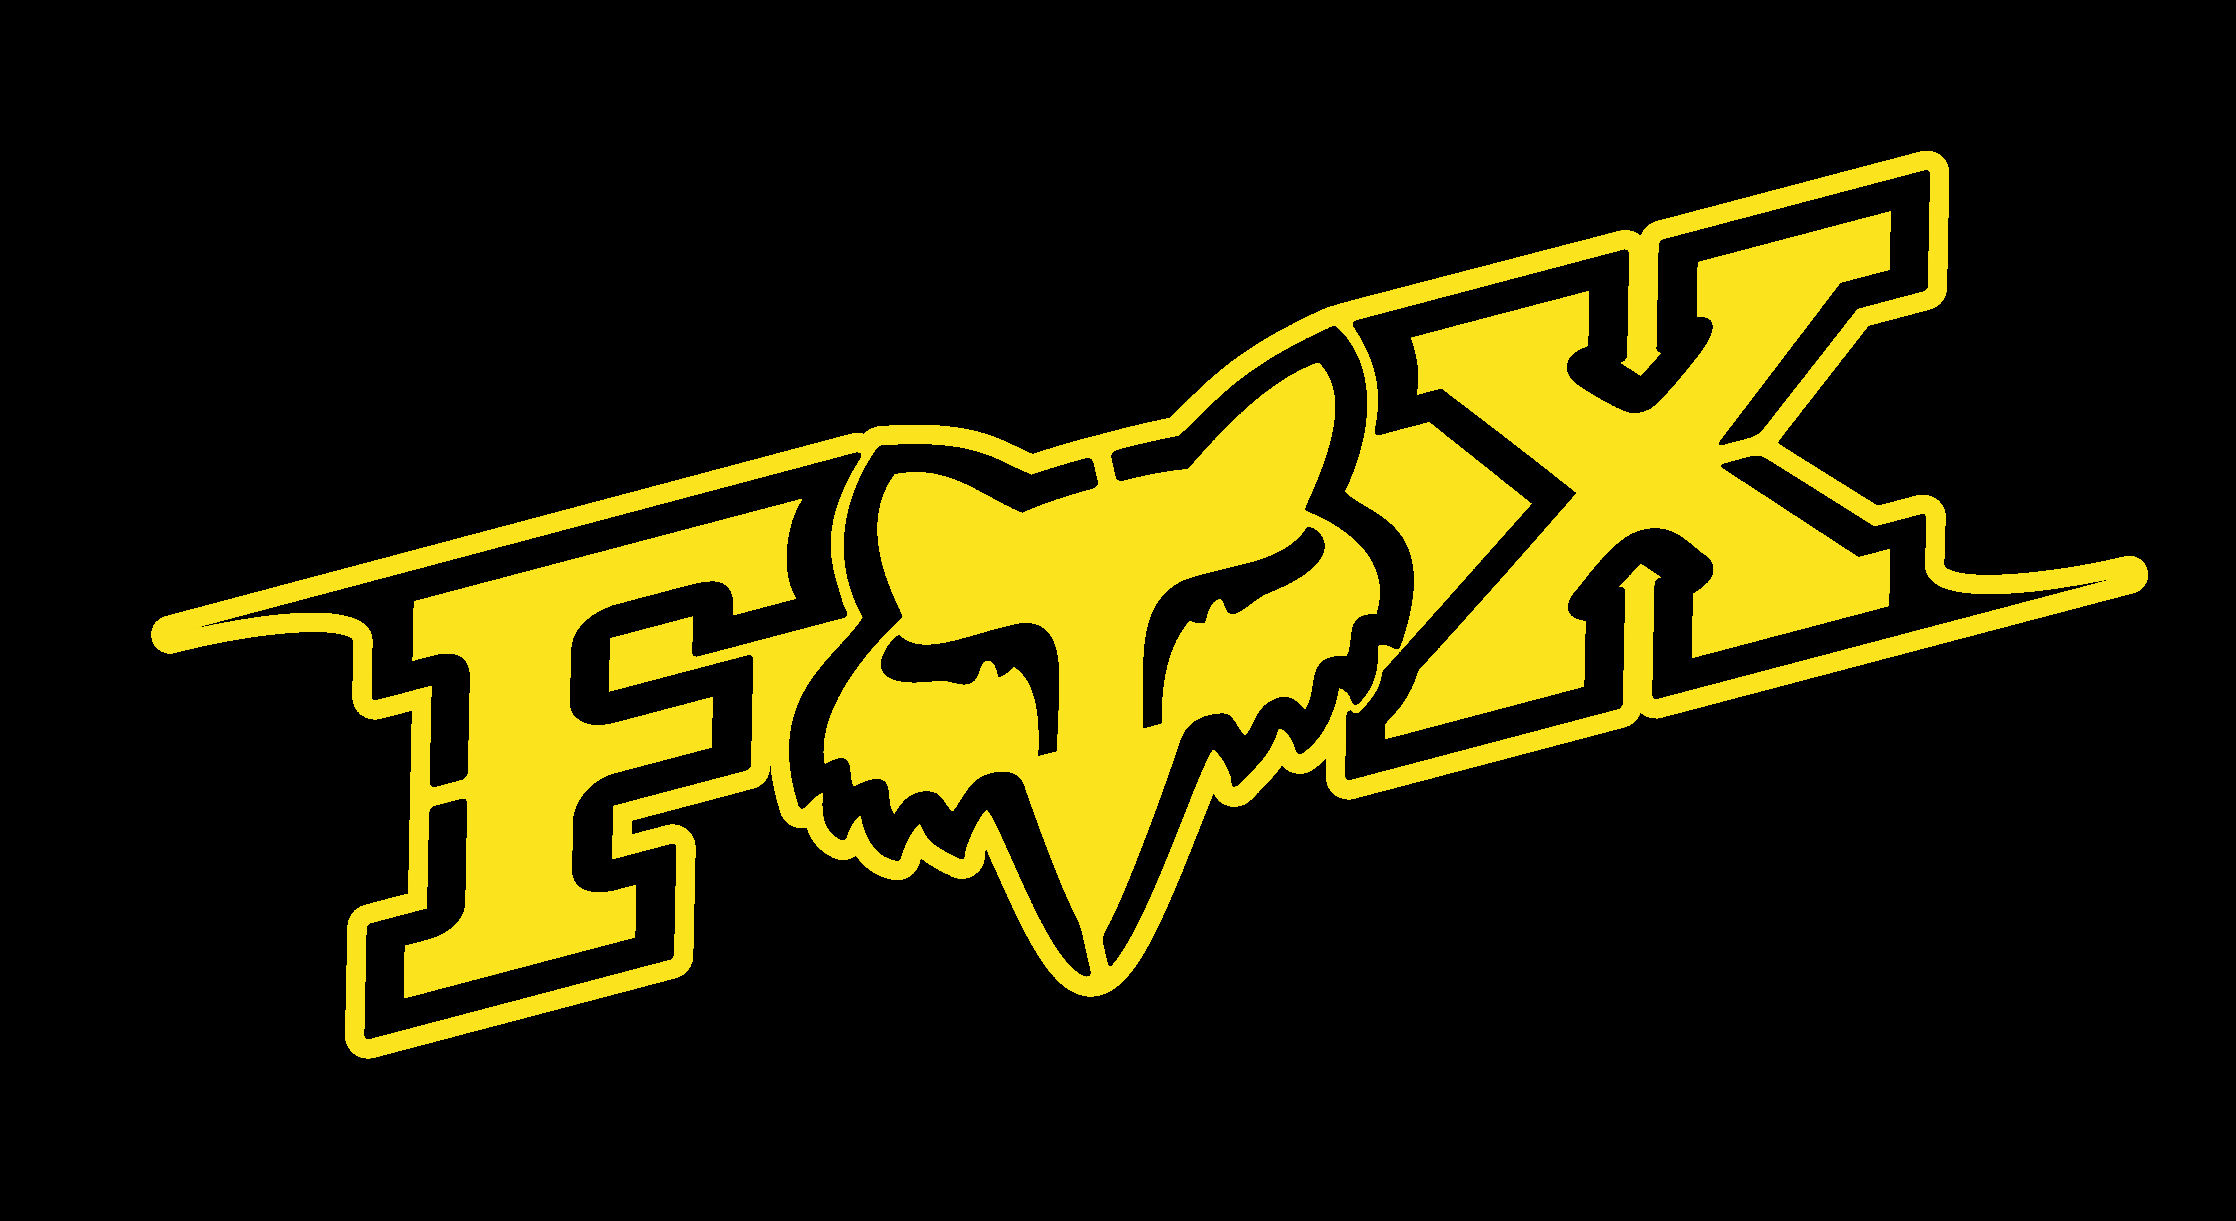 File Name 806838 Best Logos Wallpaper Fox Racing 806838 Logos 2236x1221